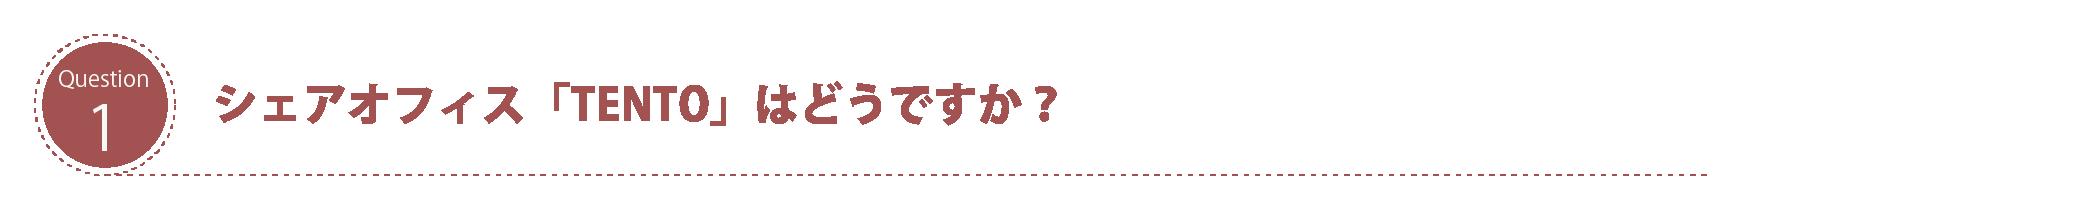 question -01